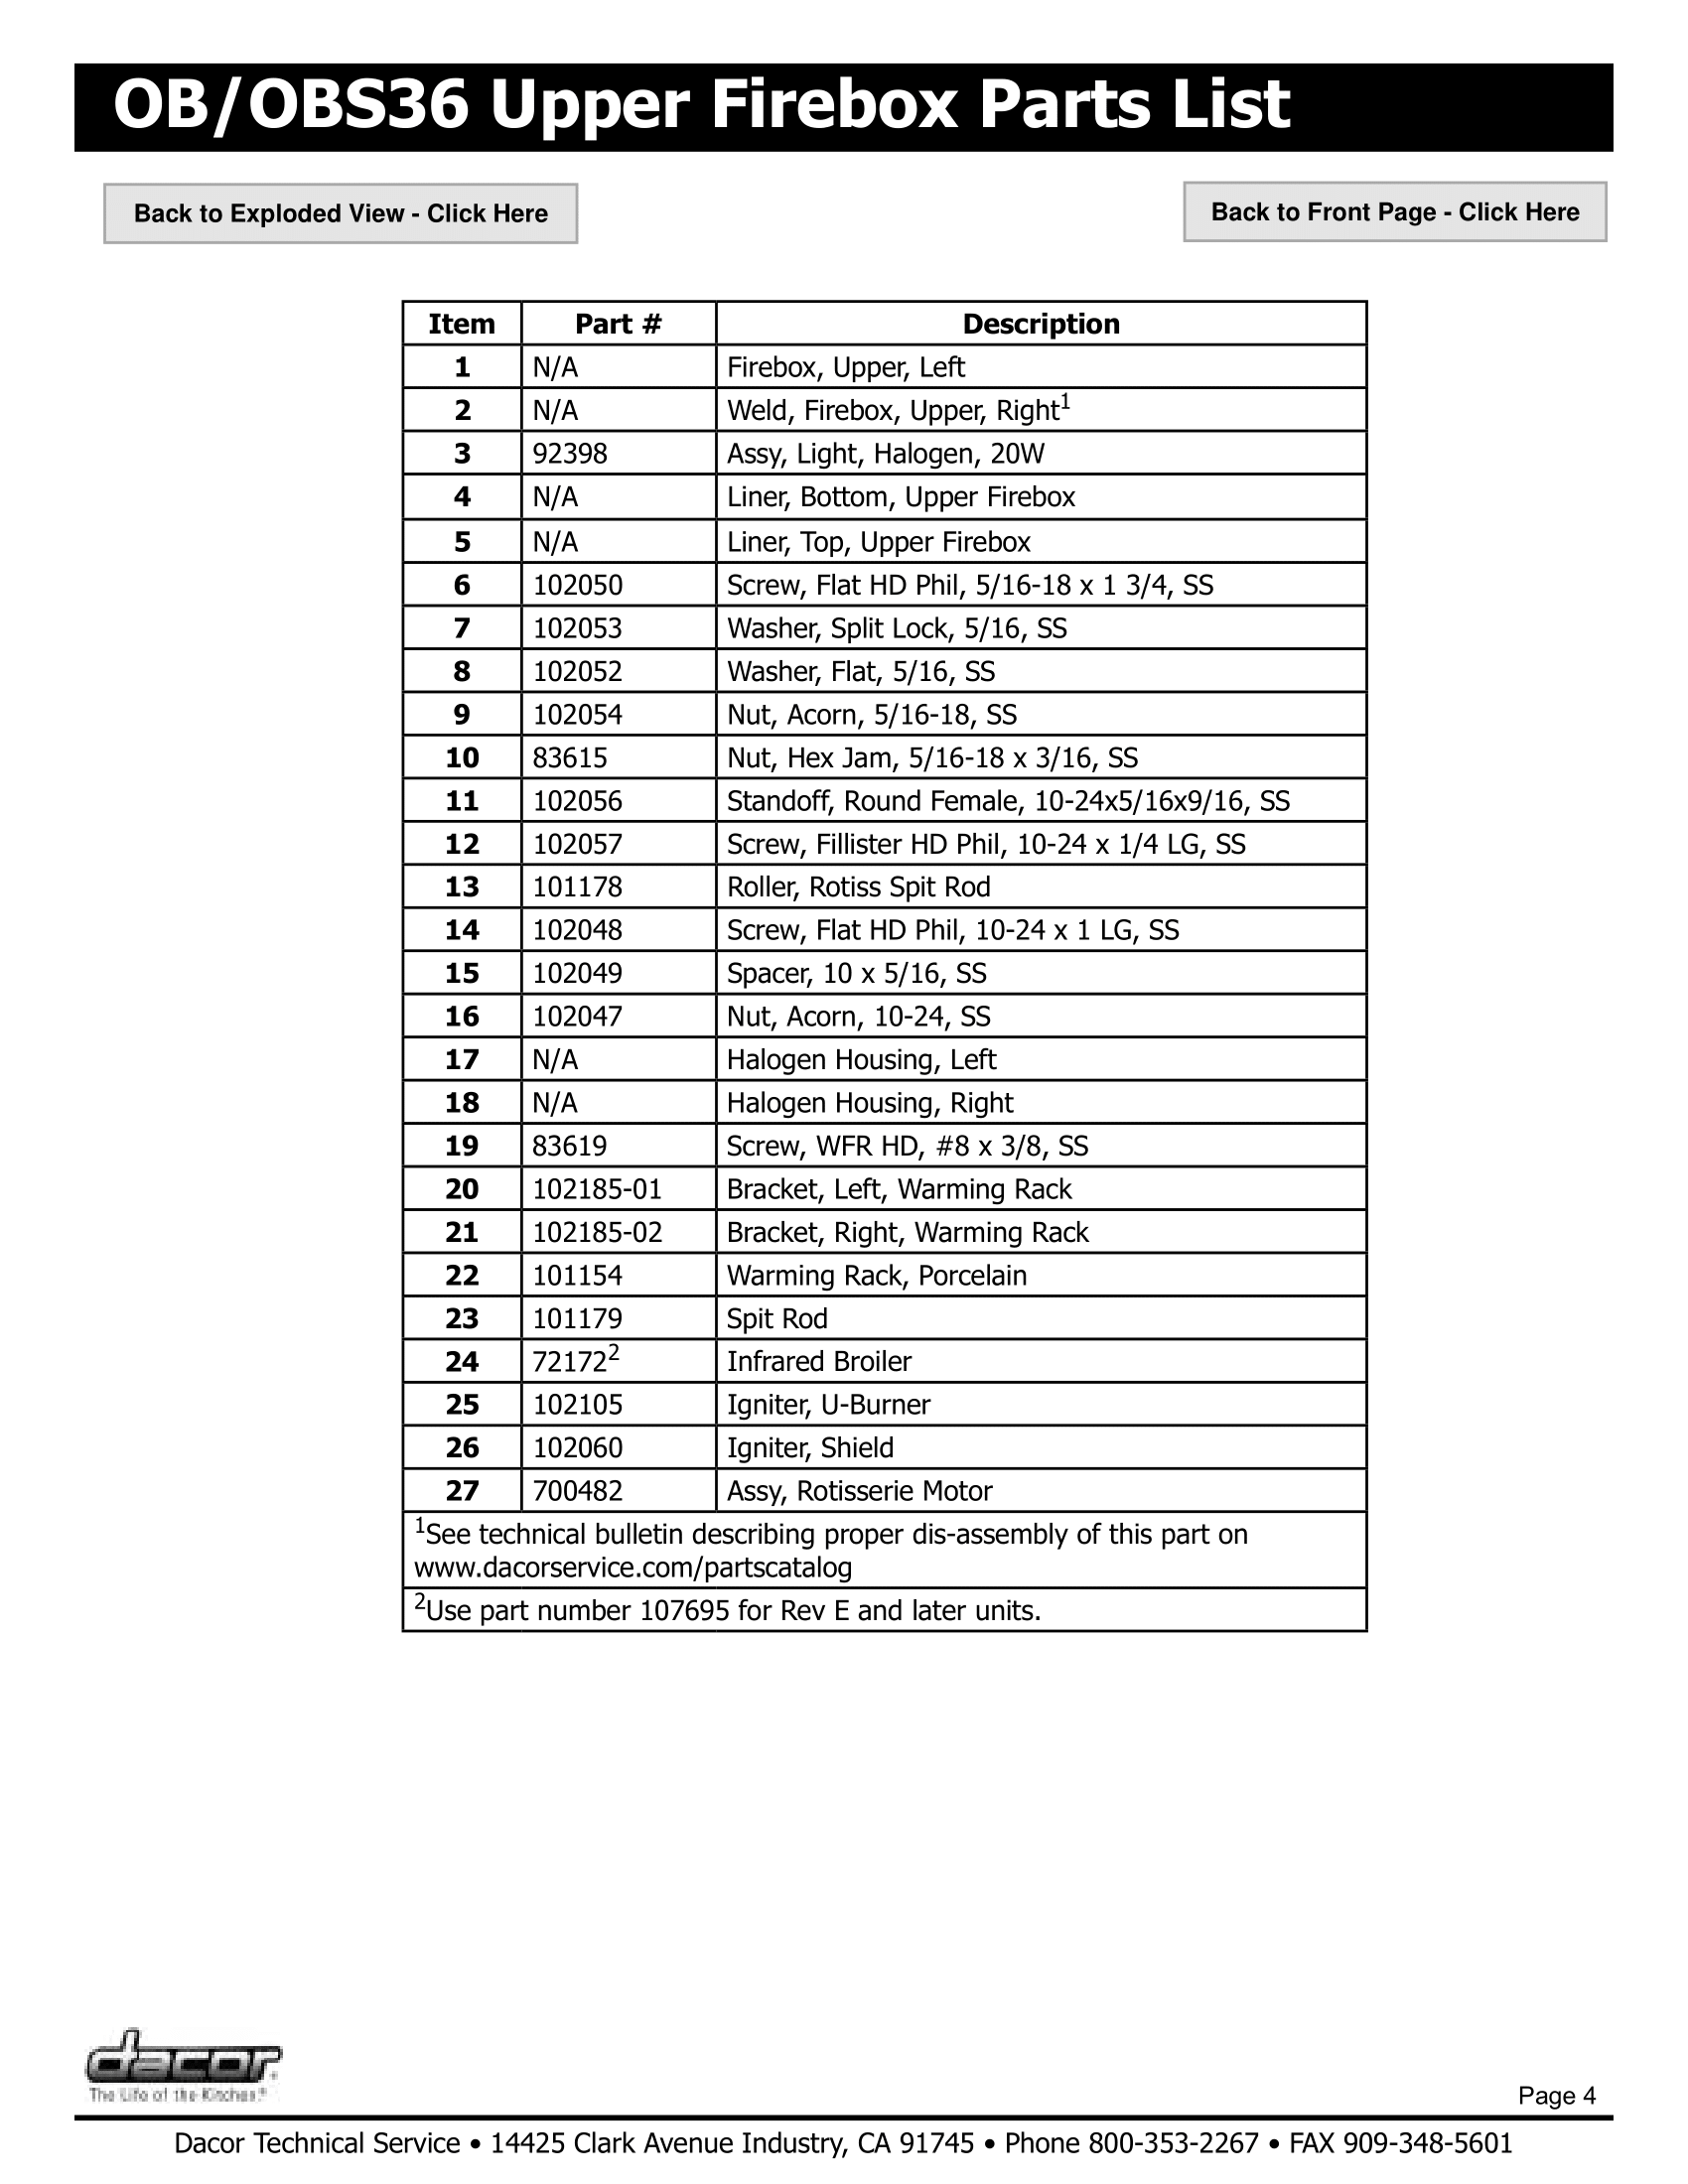 Dacor OB36 Upper Firebox Assembly Parts List